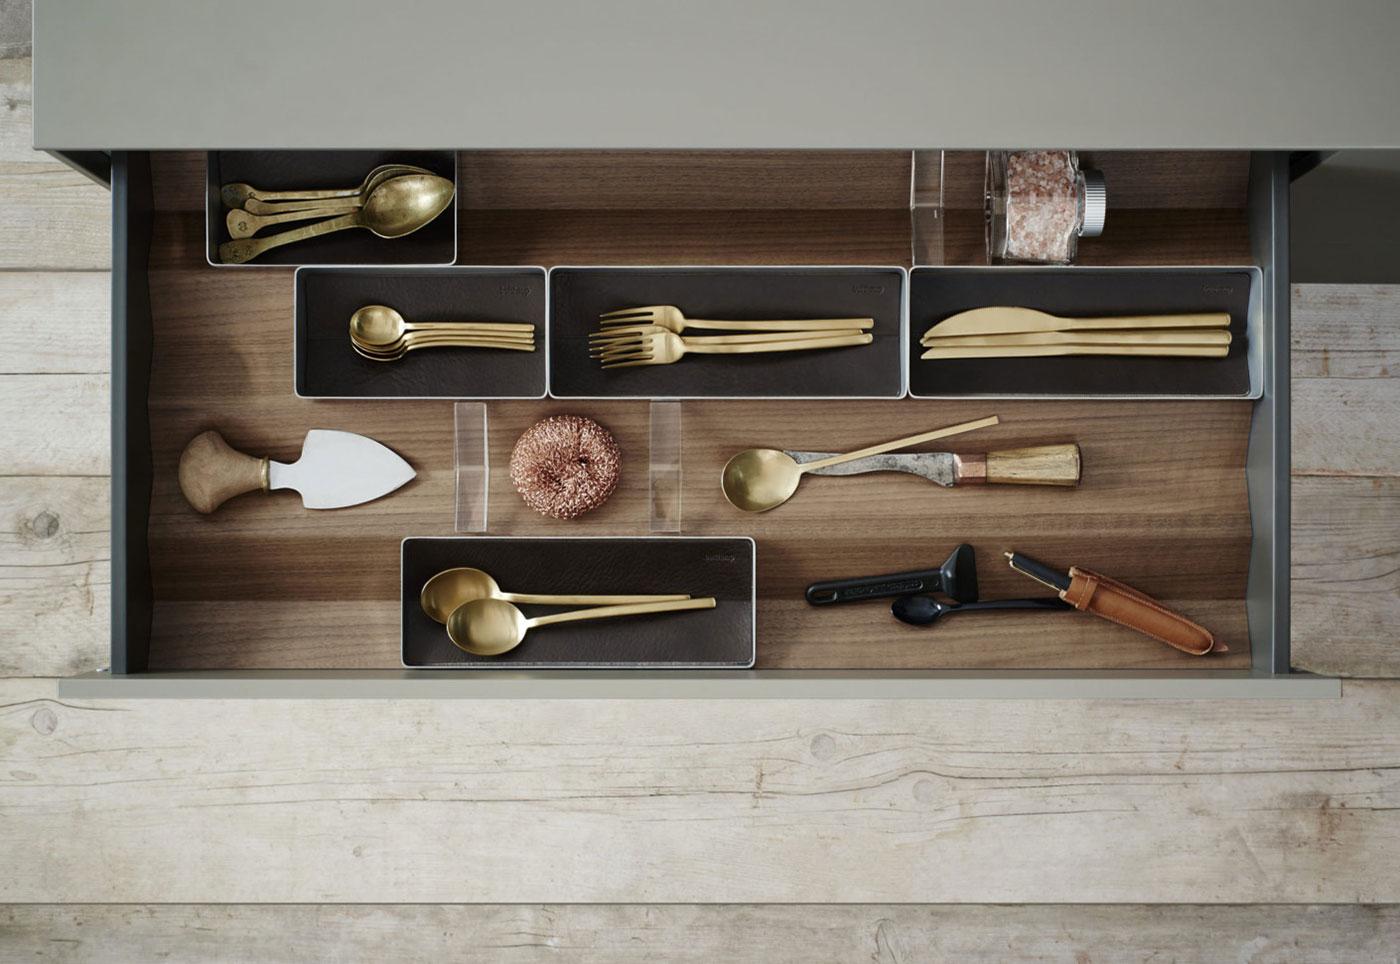 Obegi-Home-Bulthaup-Kitchens-b3-Interior-System-09